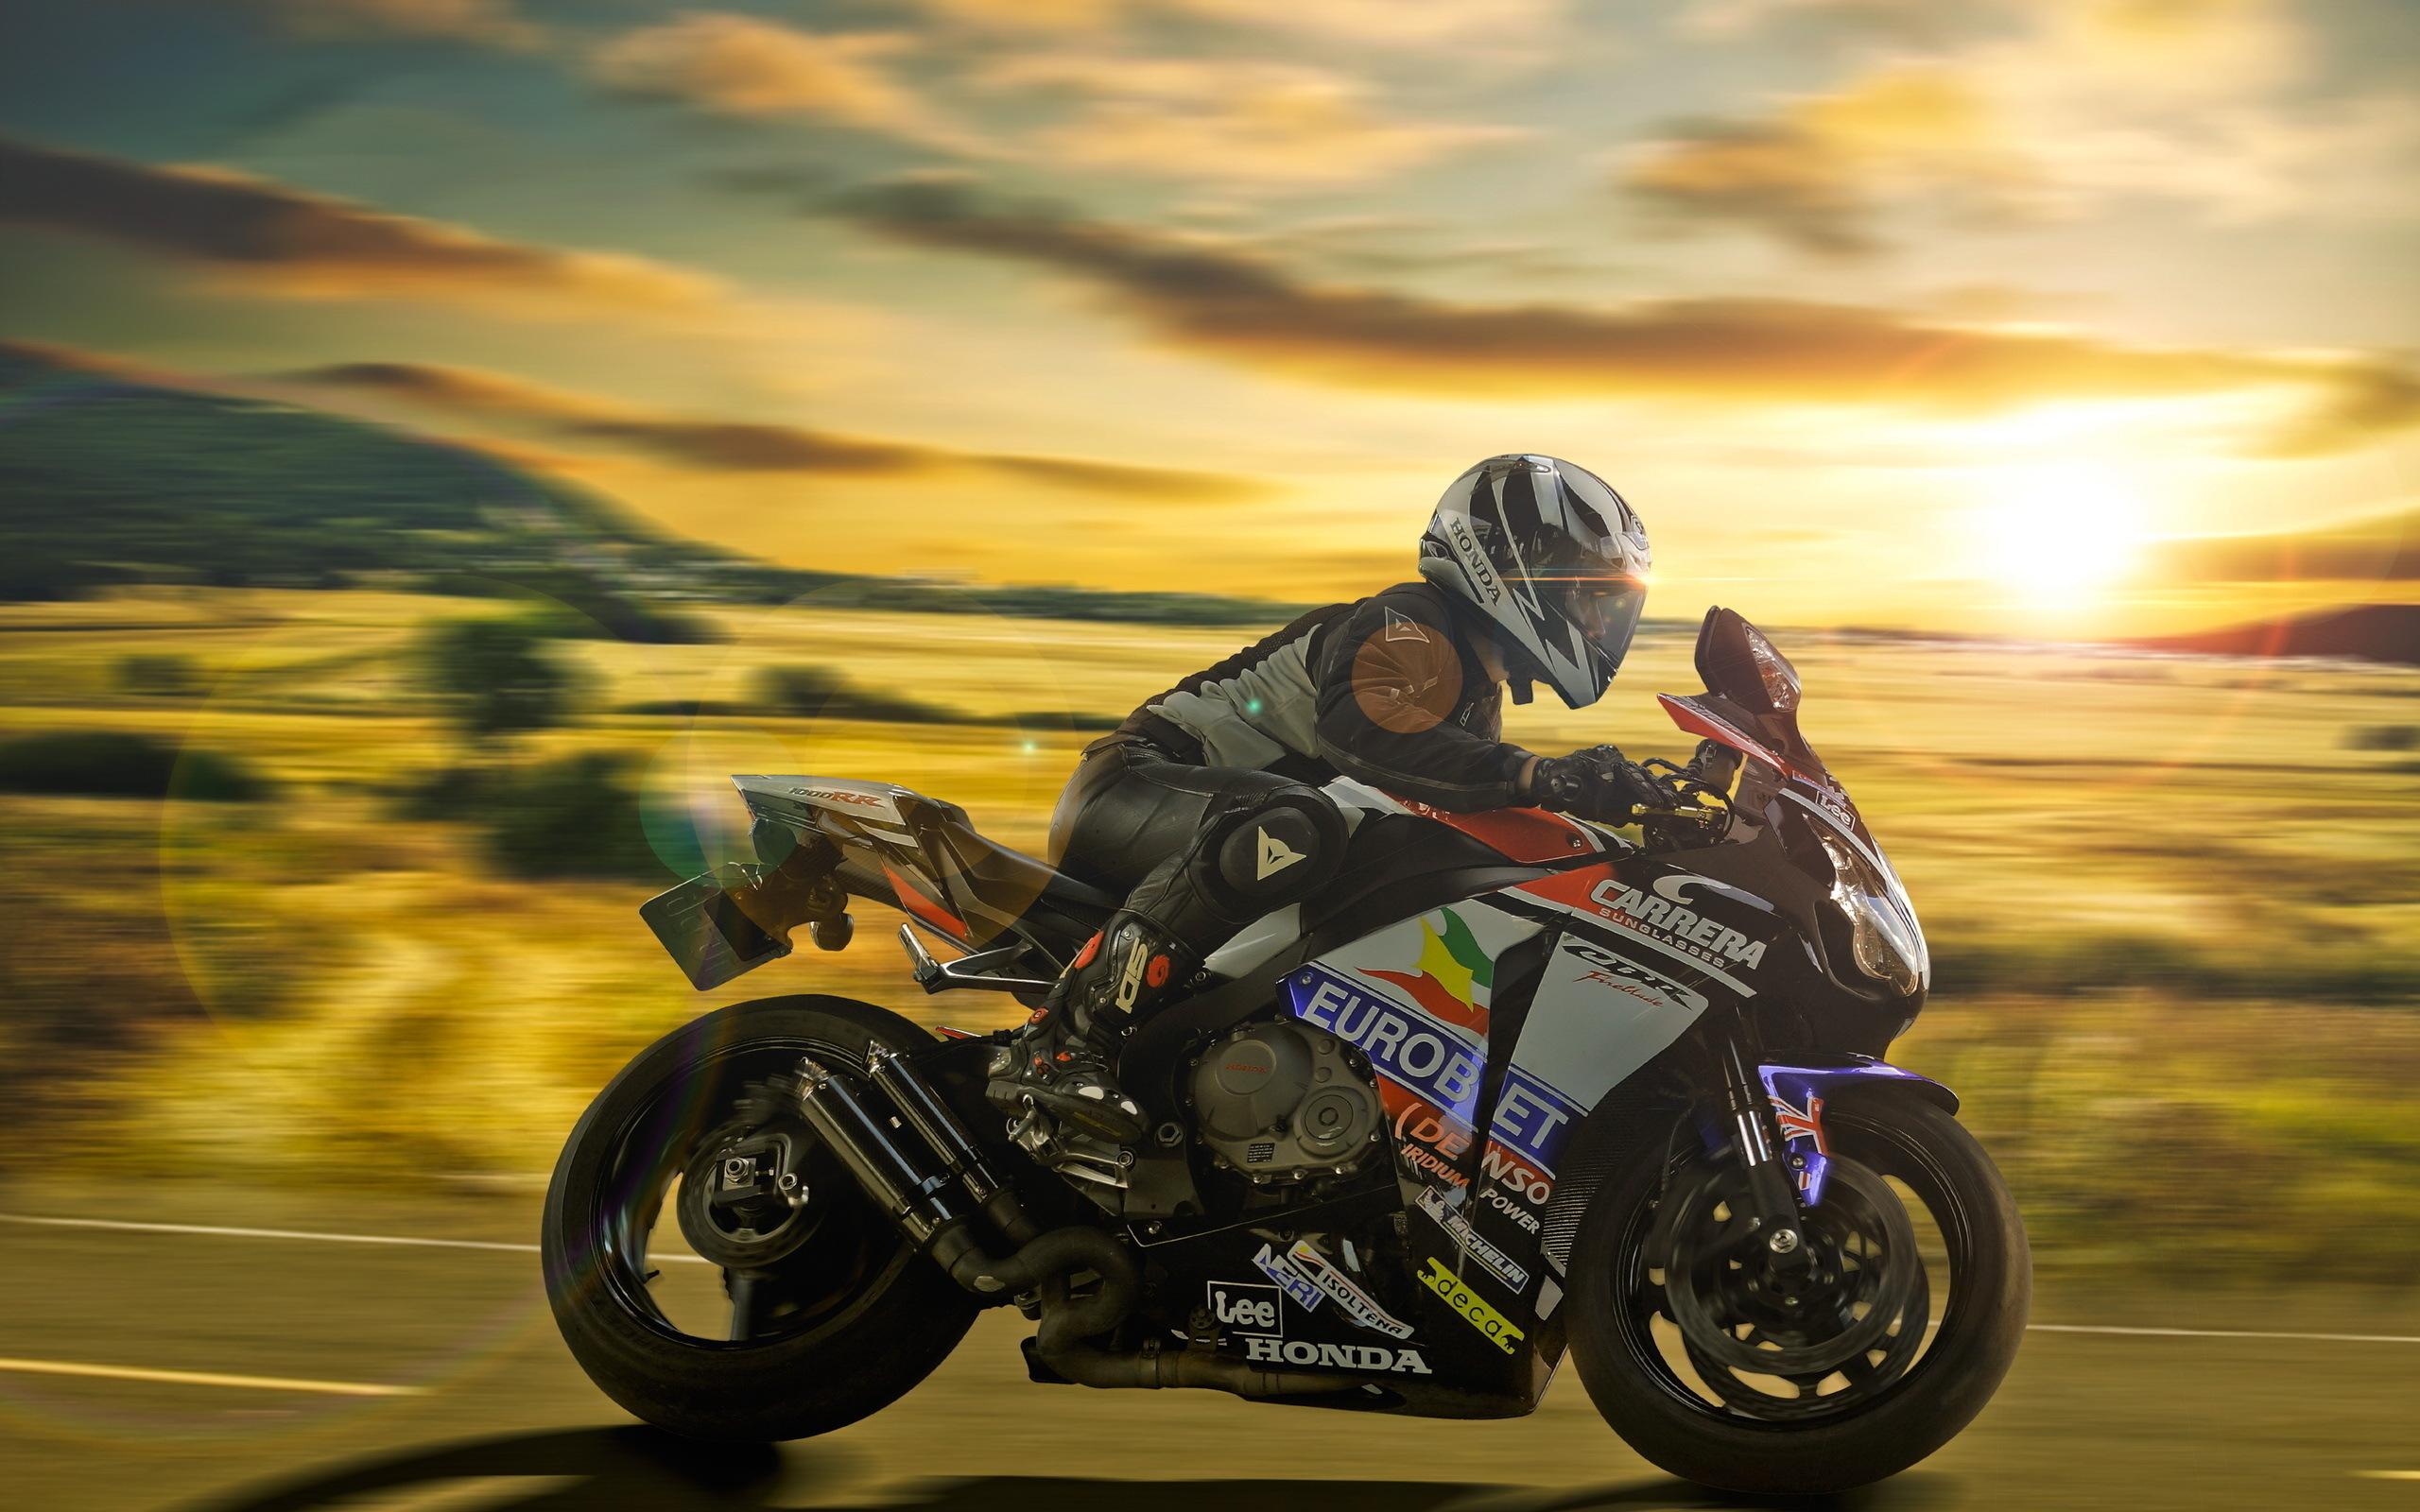 Honda Fireblade Cbr, HD Bikes, 4k Wallpapers, Images